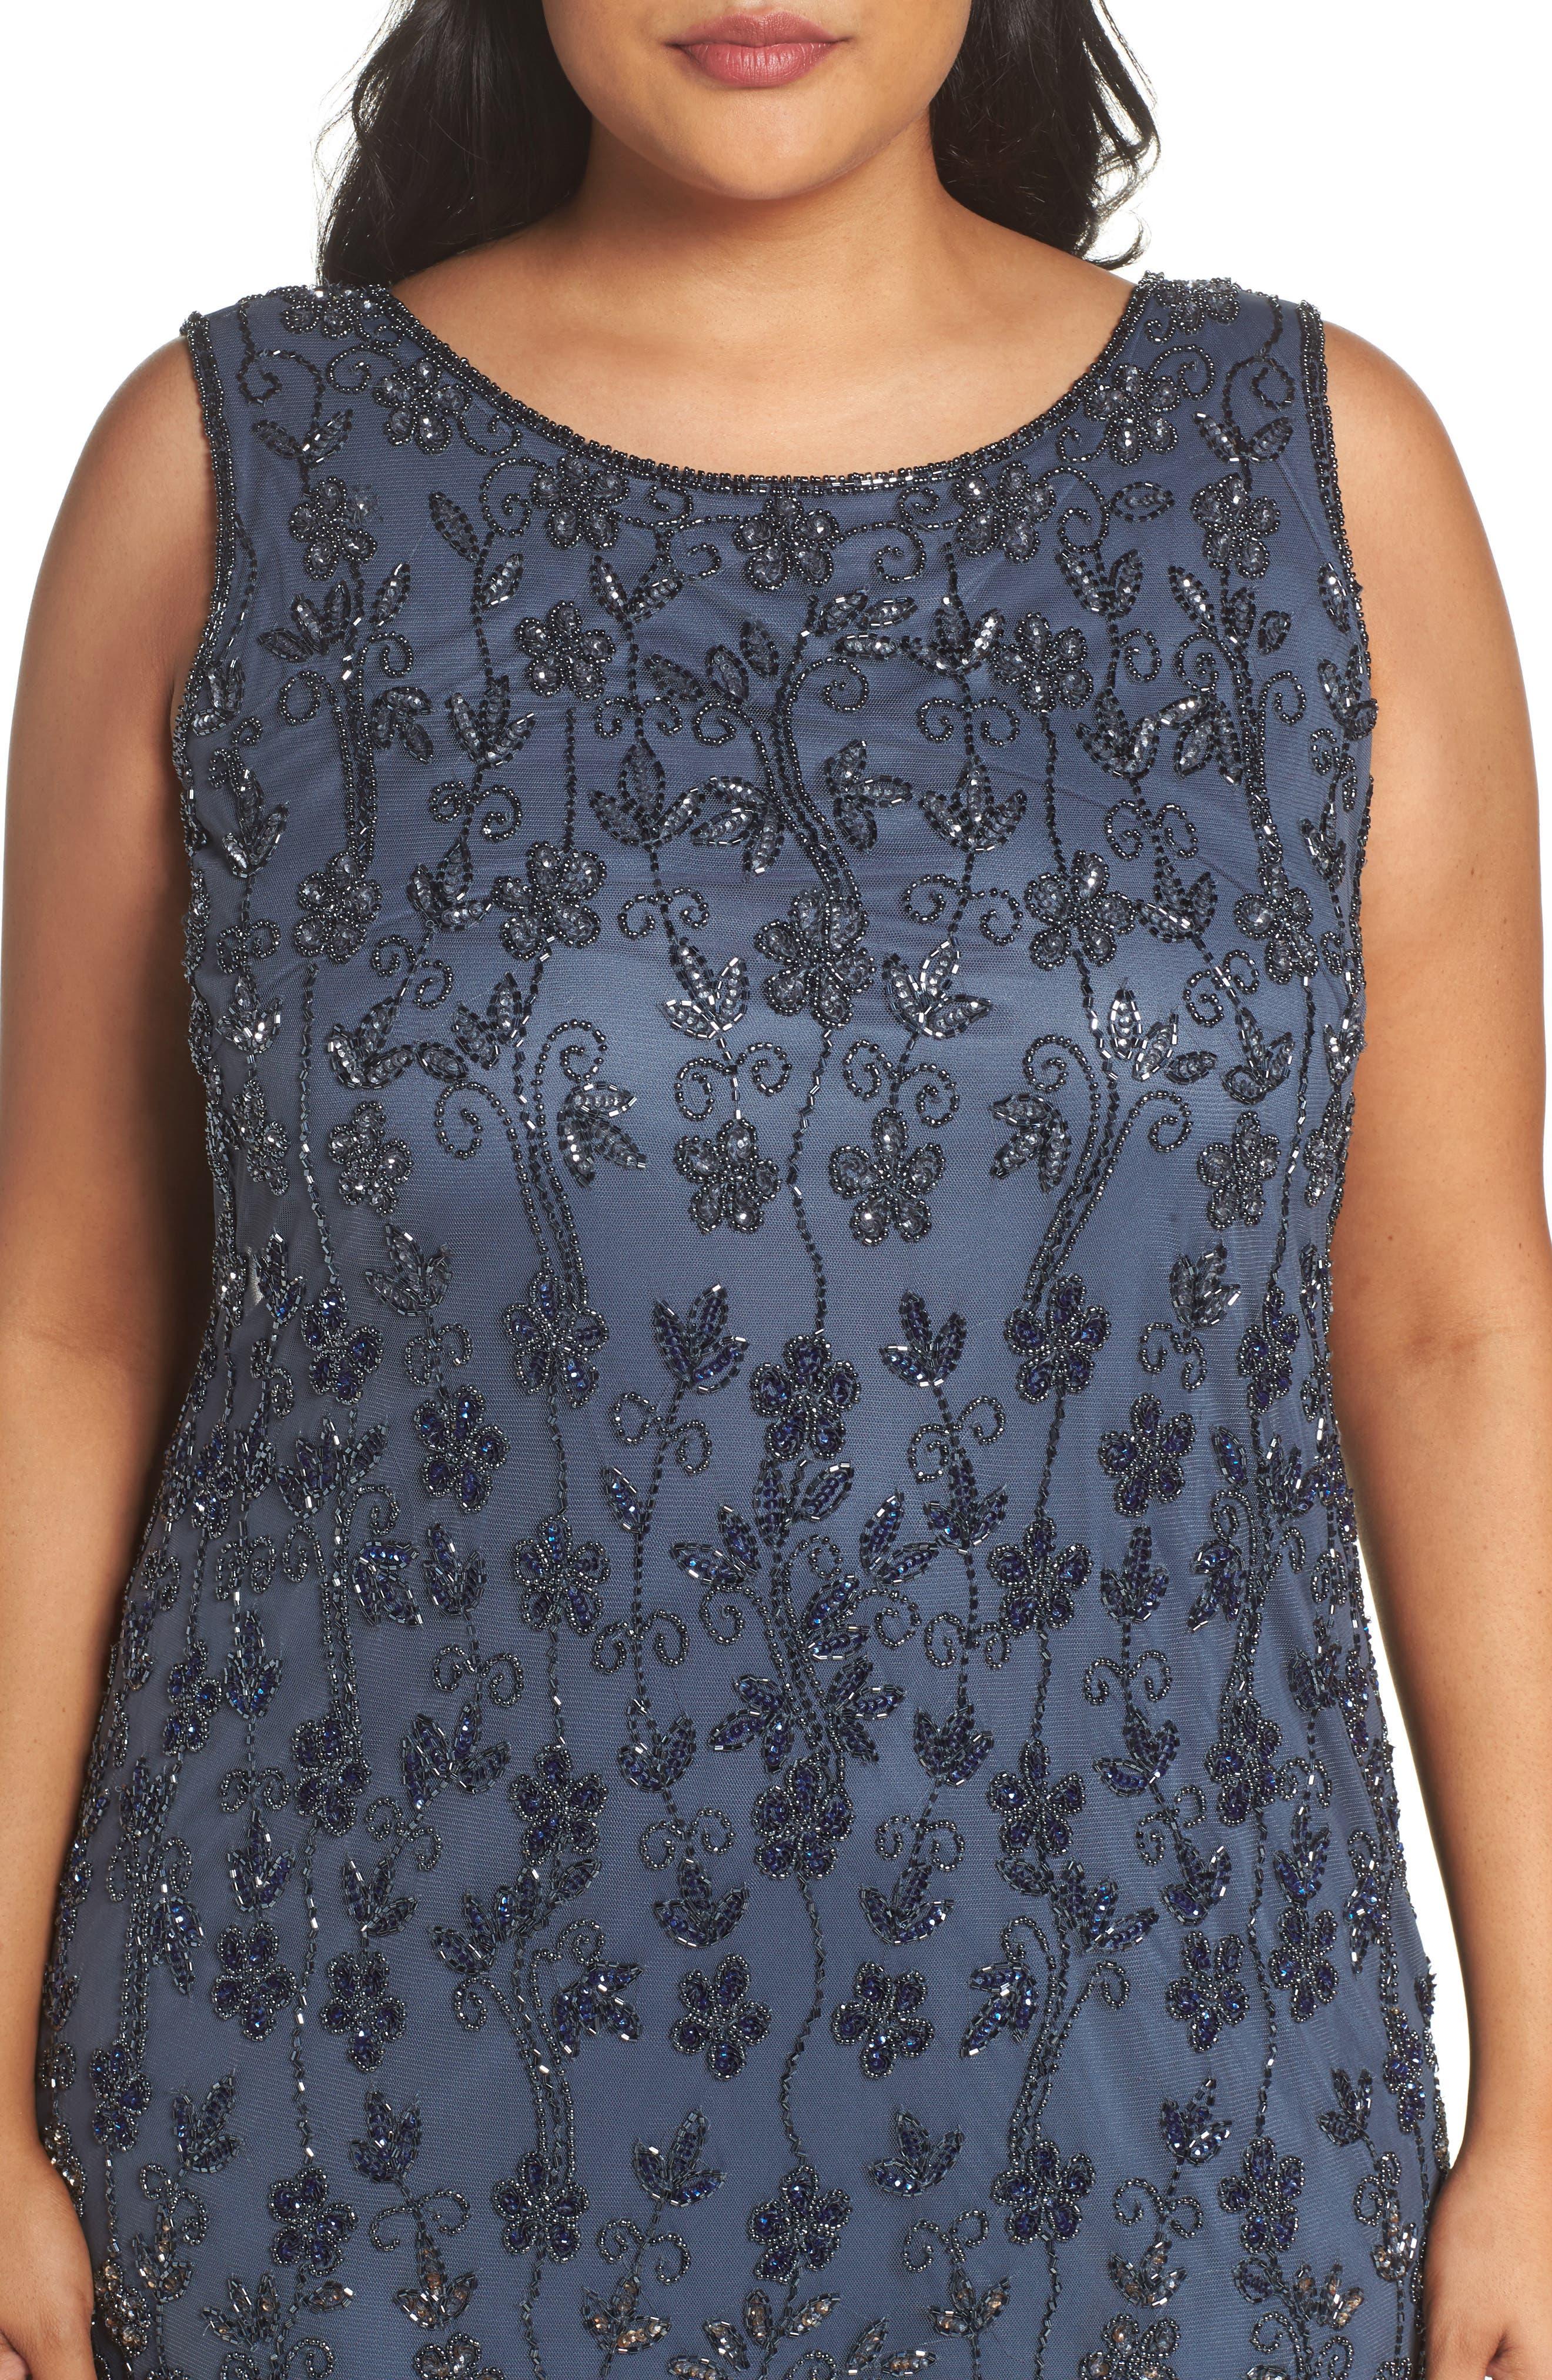 Embellished Mesh Sheath Dress,                             Alternate thumbnail 4, color,                             New Grey